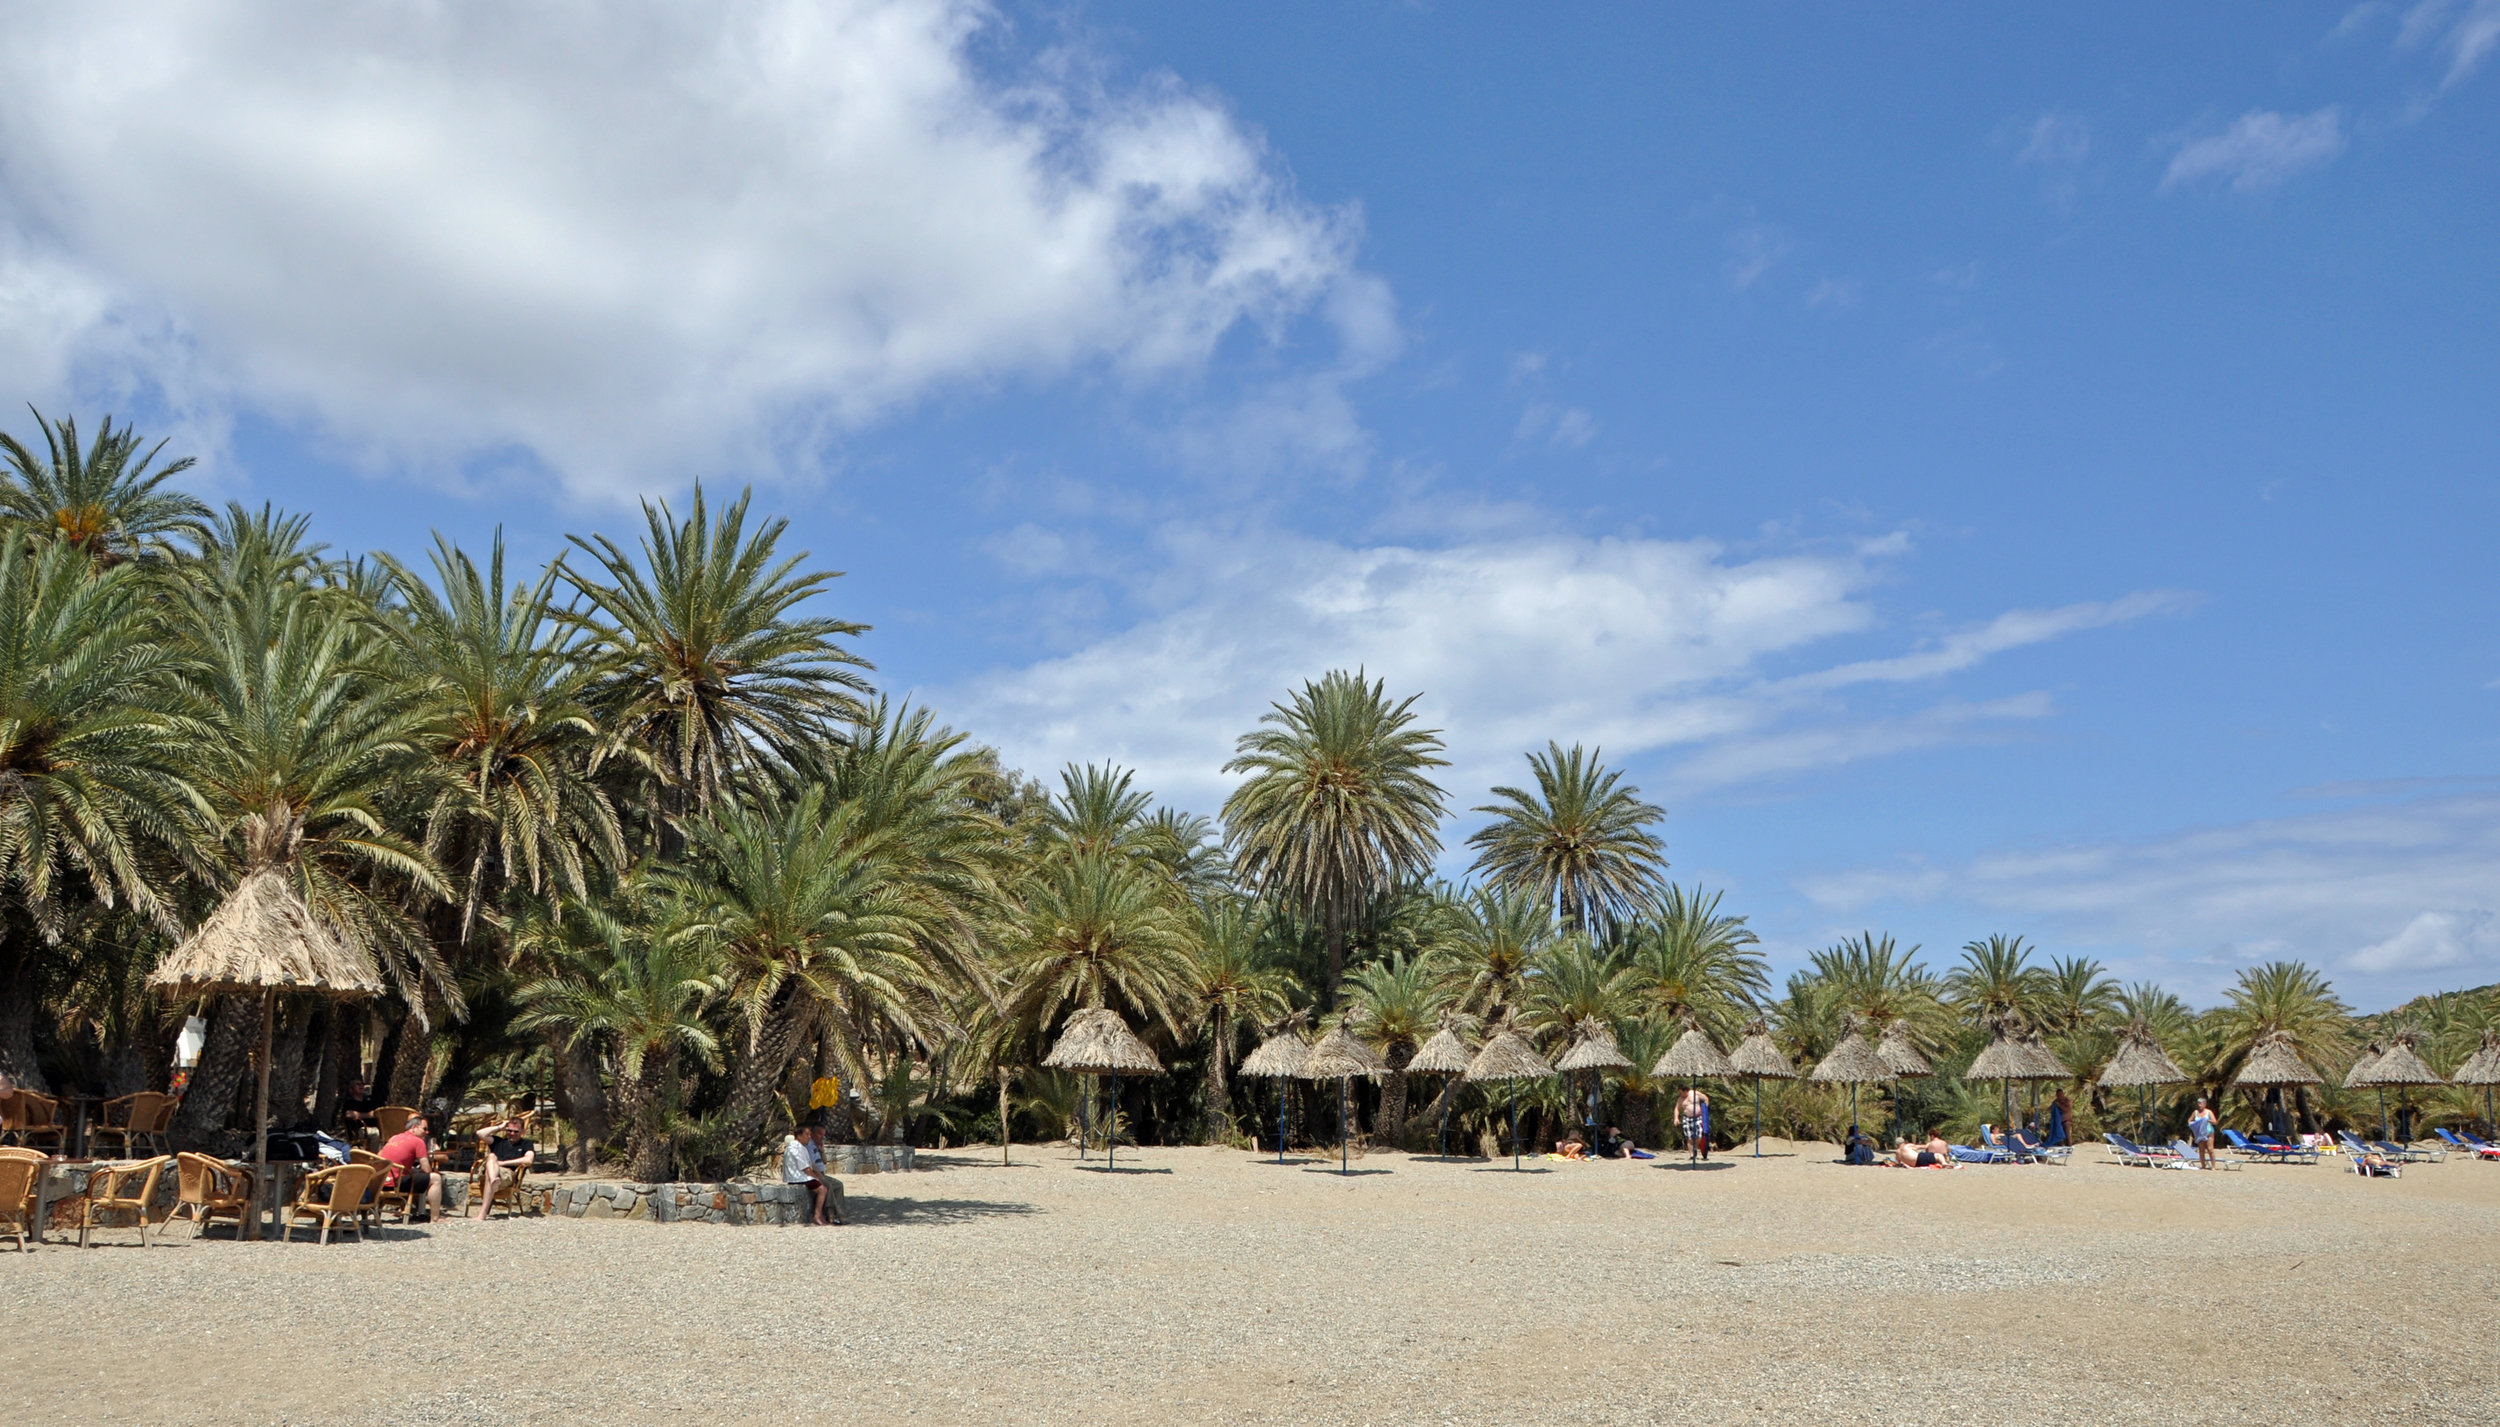 vai-strand-palmenstrand-vakantie-kreta-griekenland.jpg